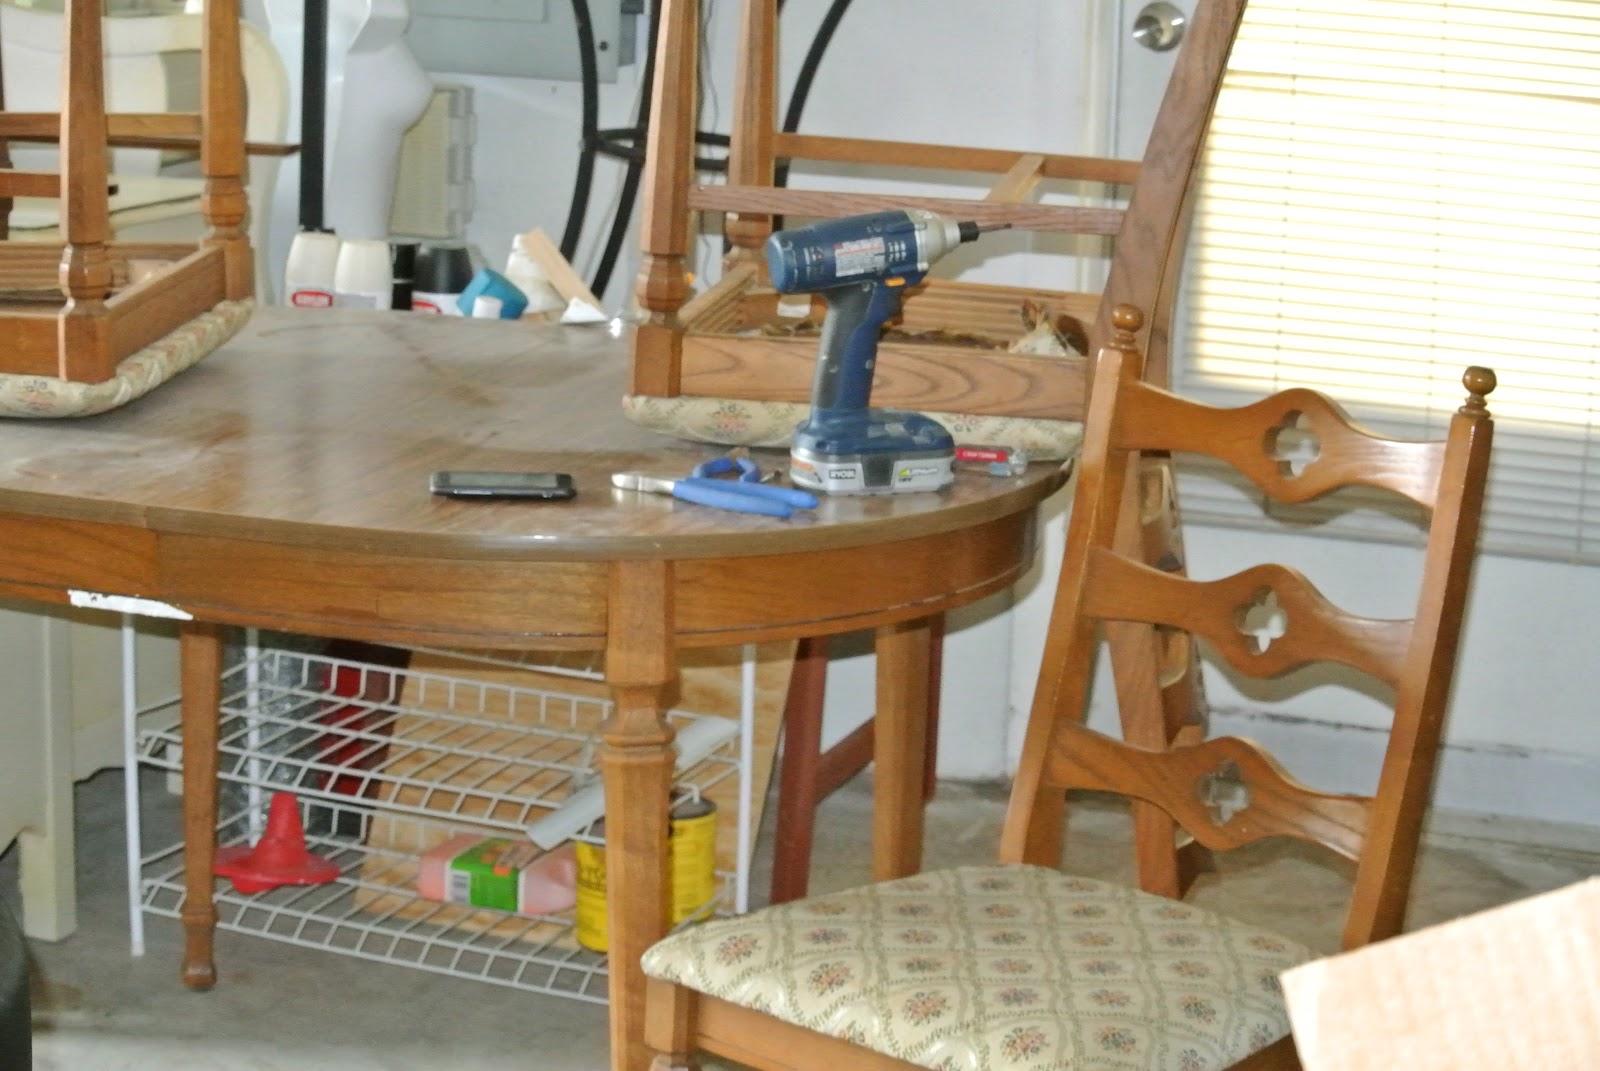 Dining room table redo ideas elegant design home for Redo table top ideas